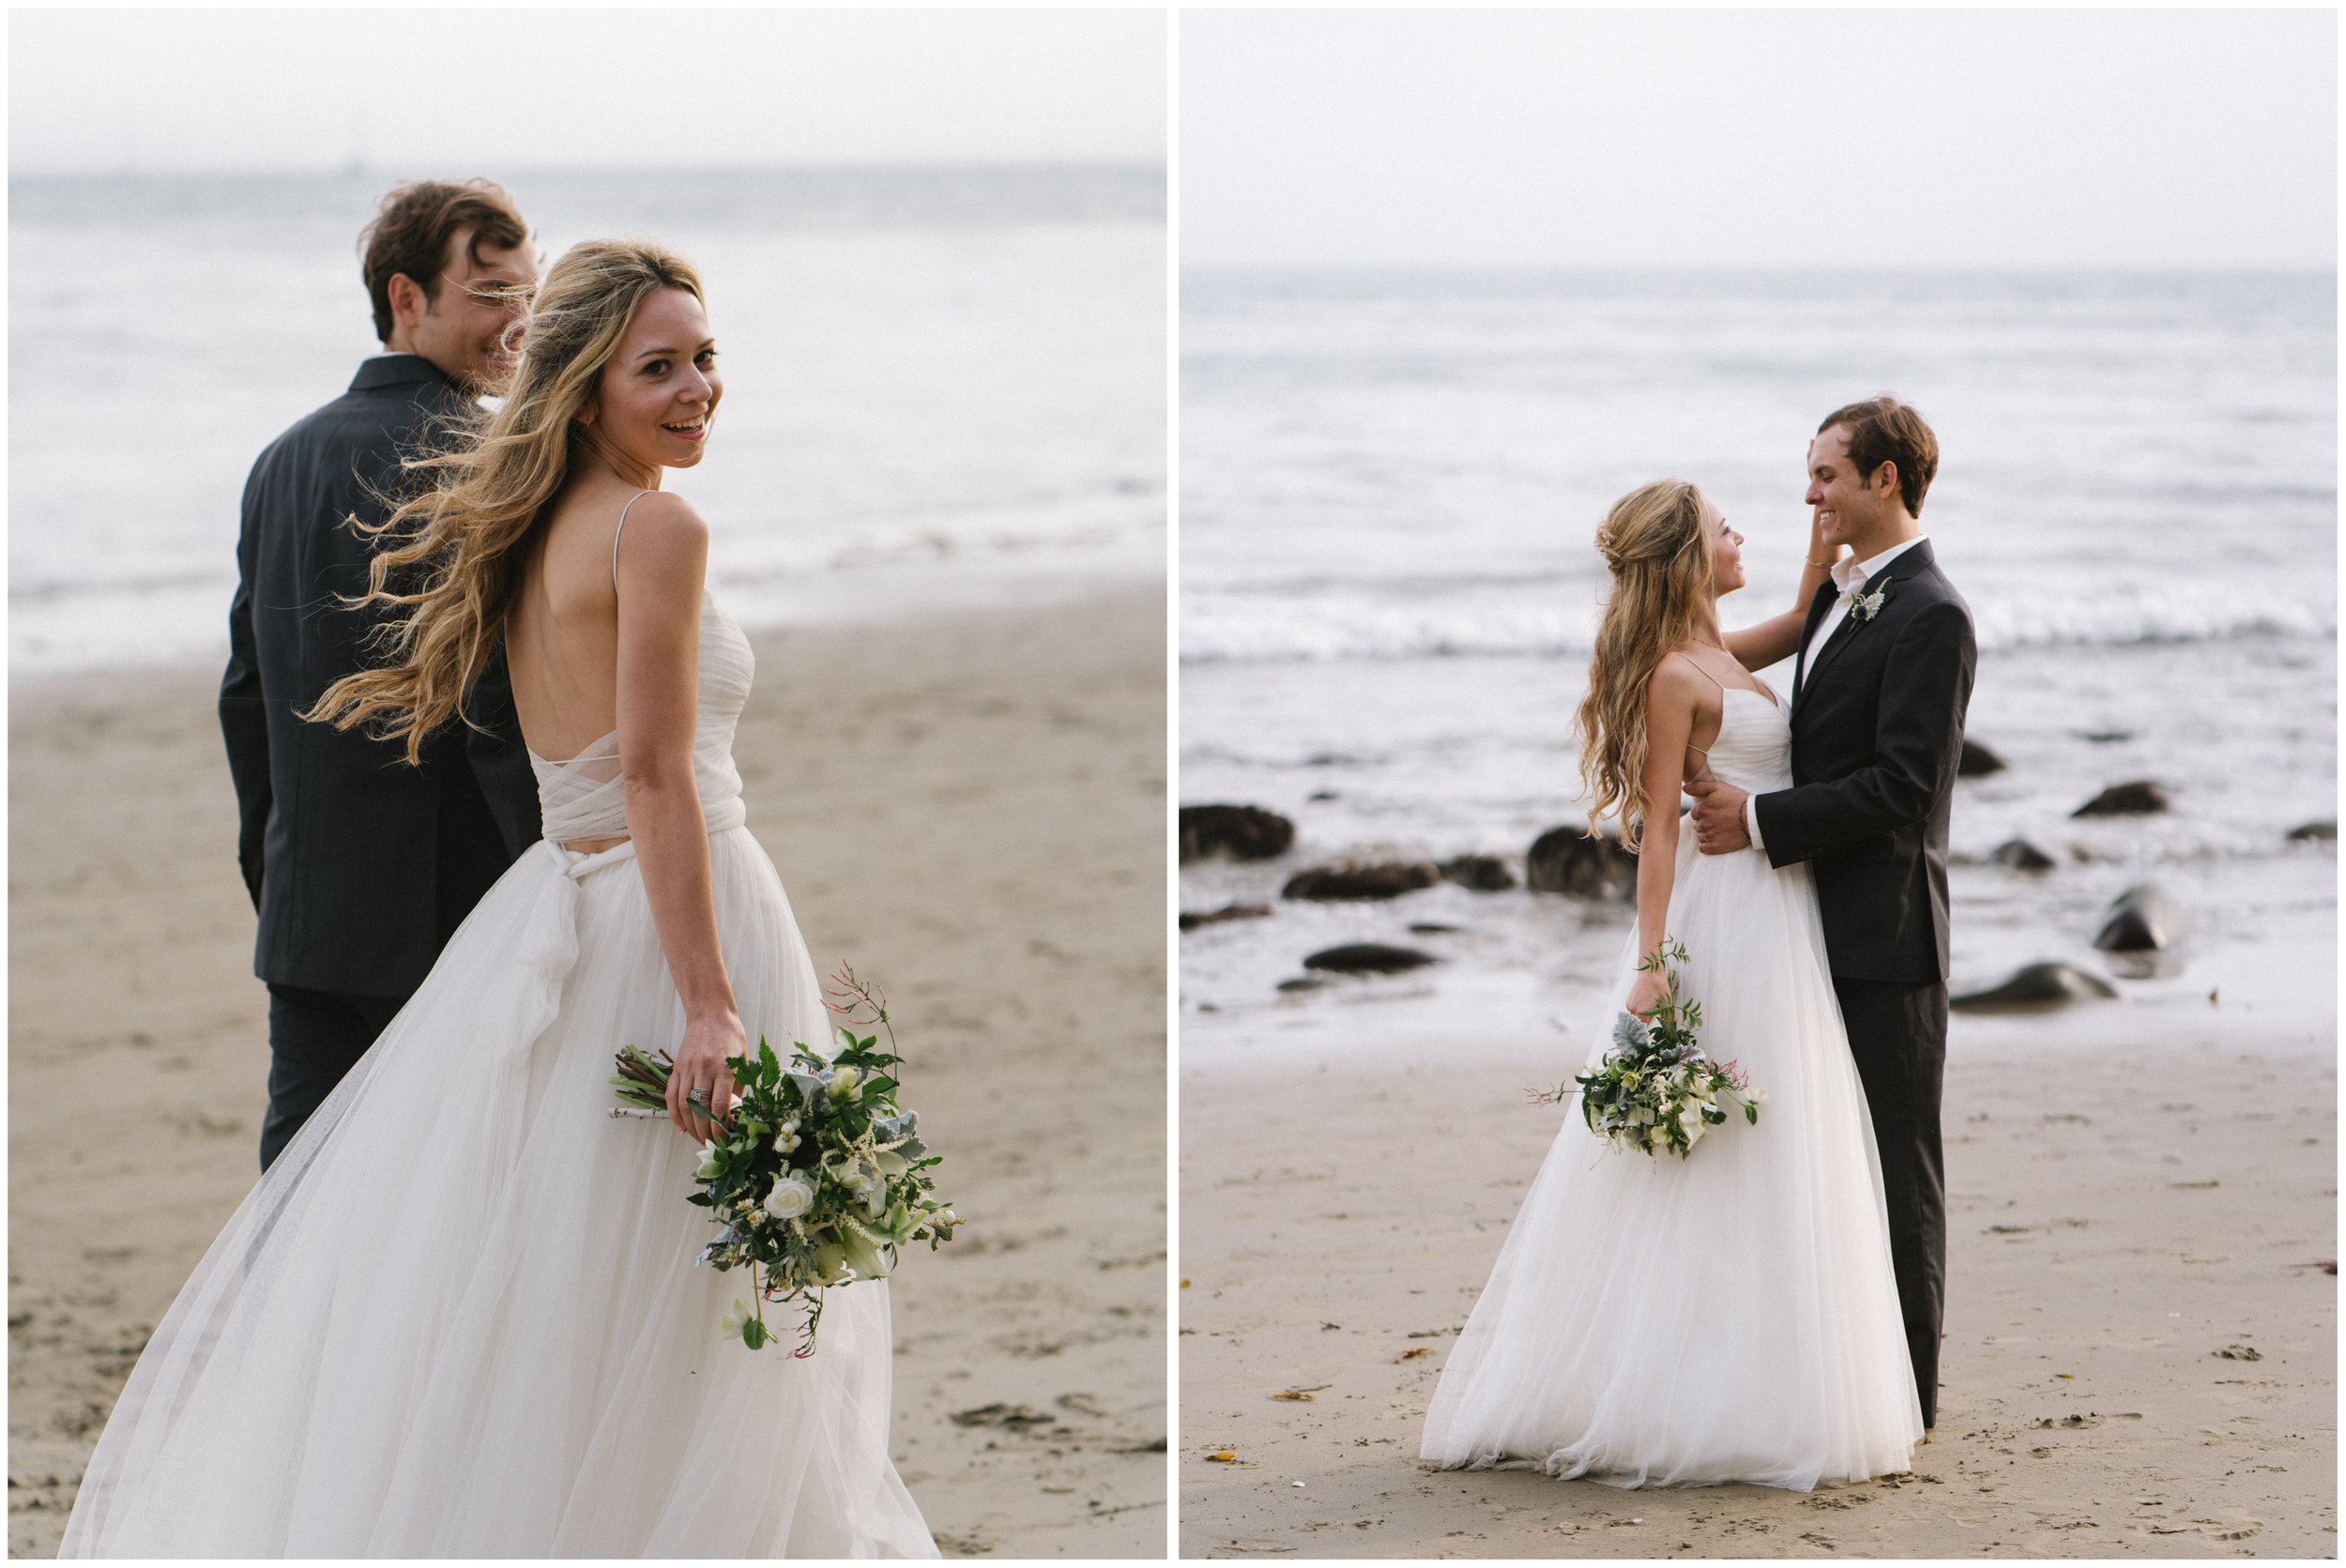 Santa Barbara Elopement Wedding Photographer - Pinnel Photography-10.jpg